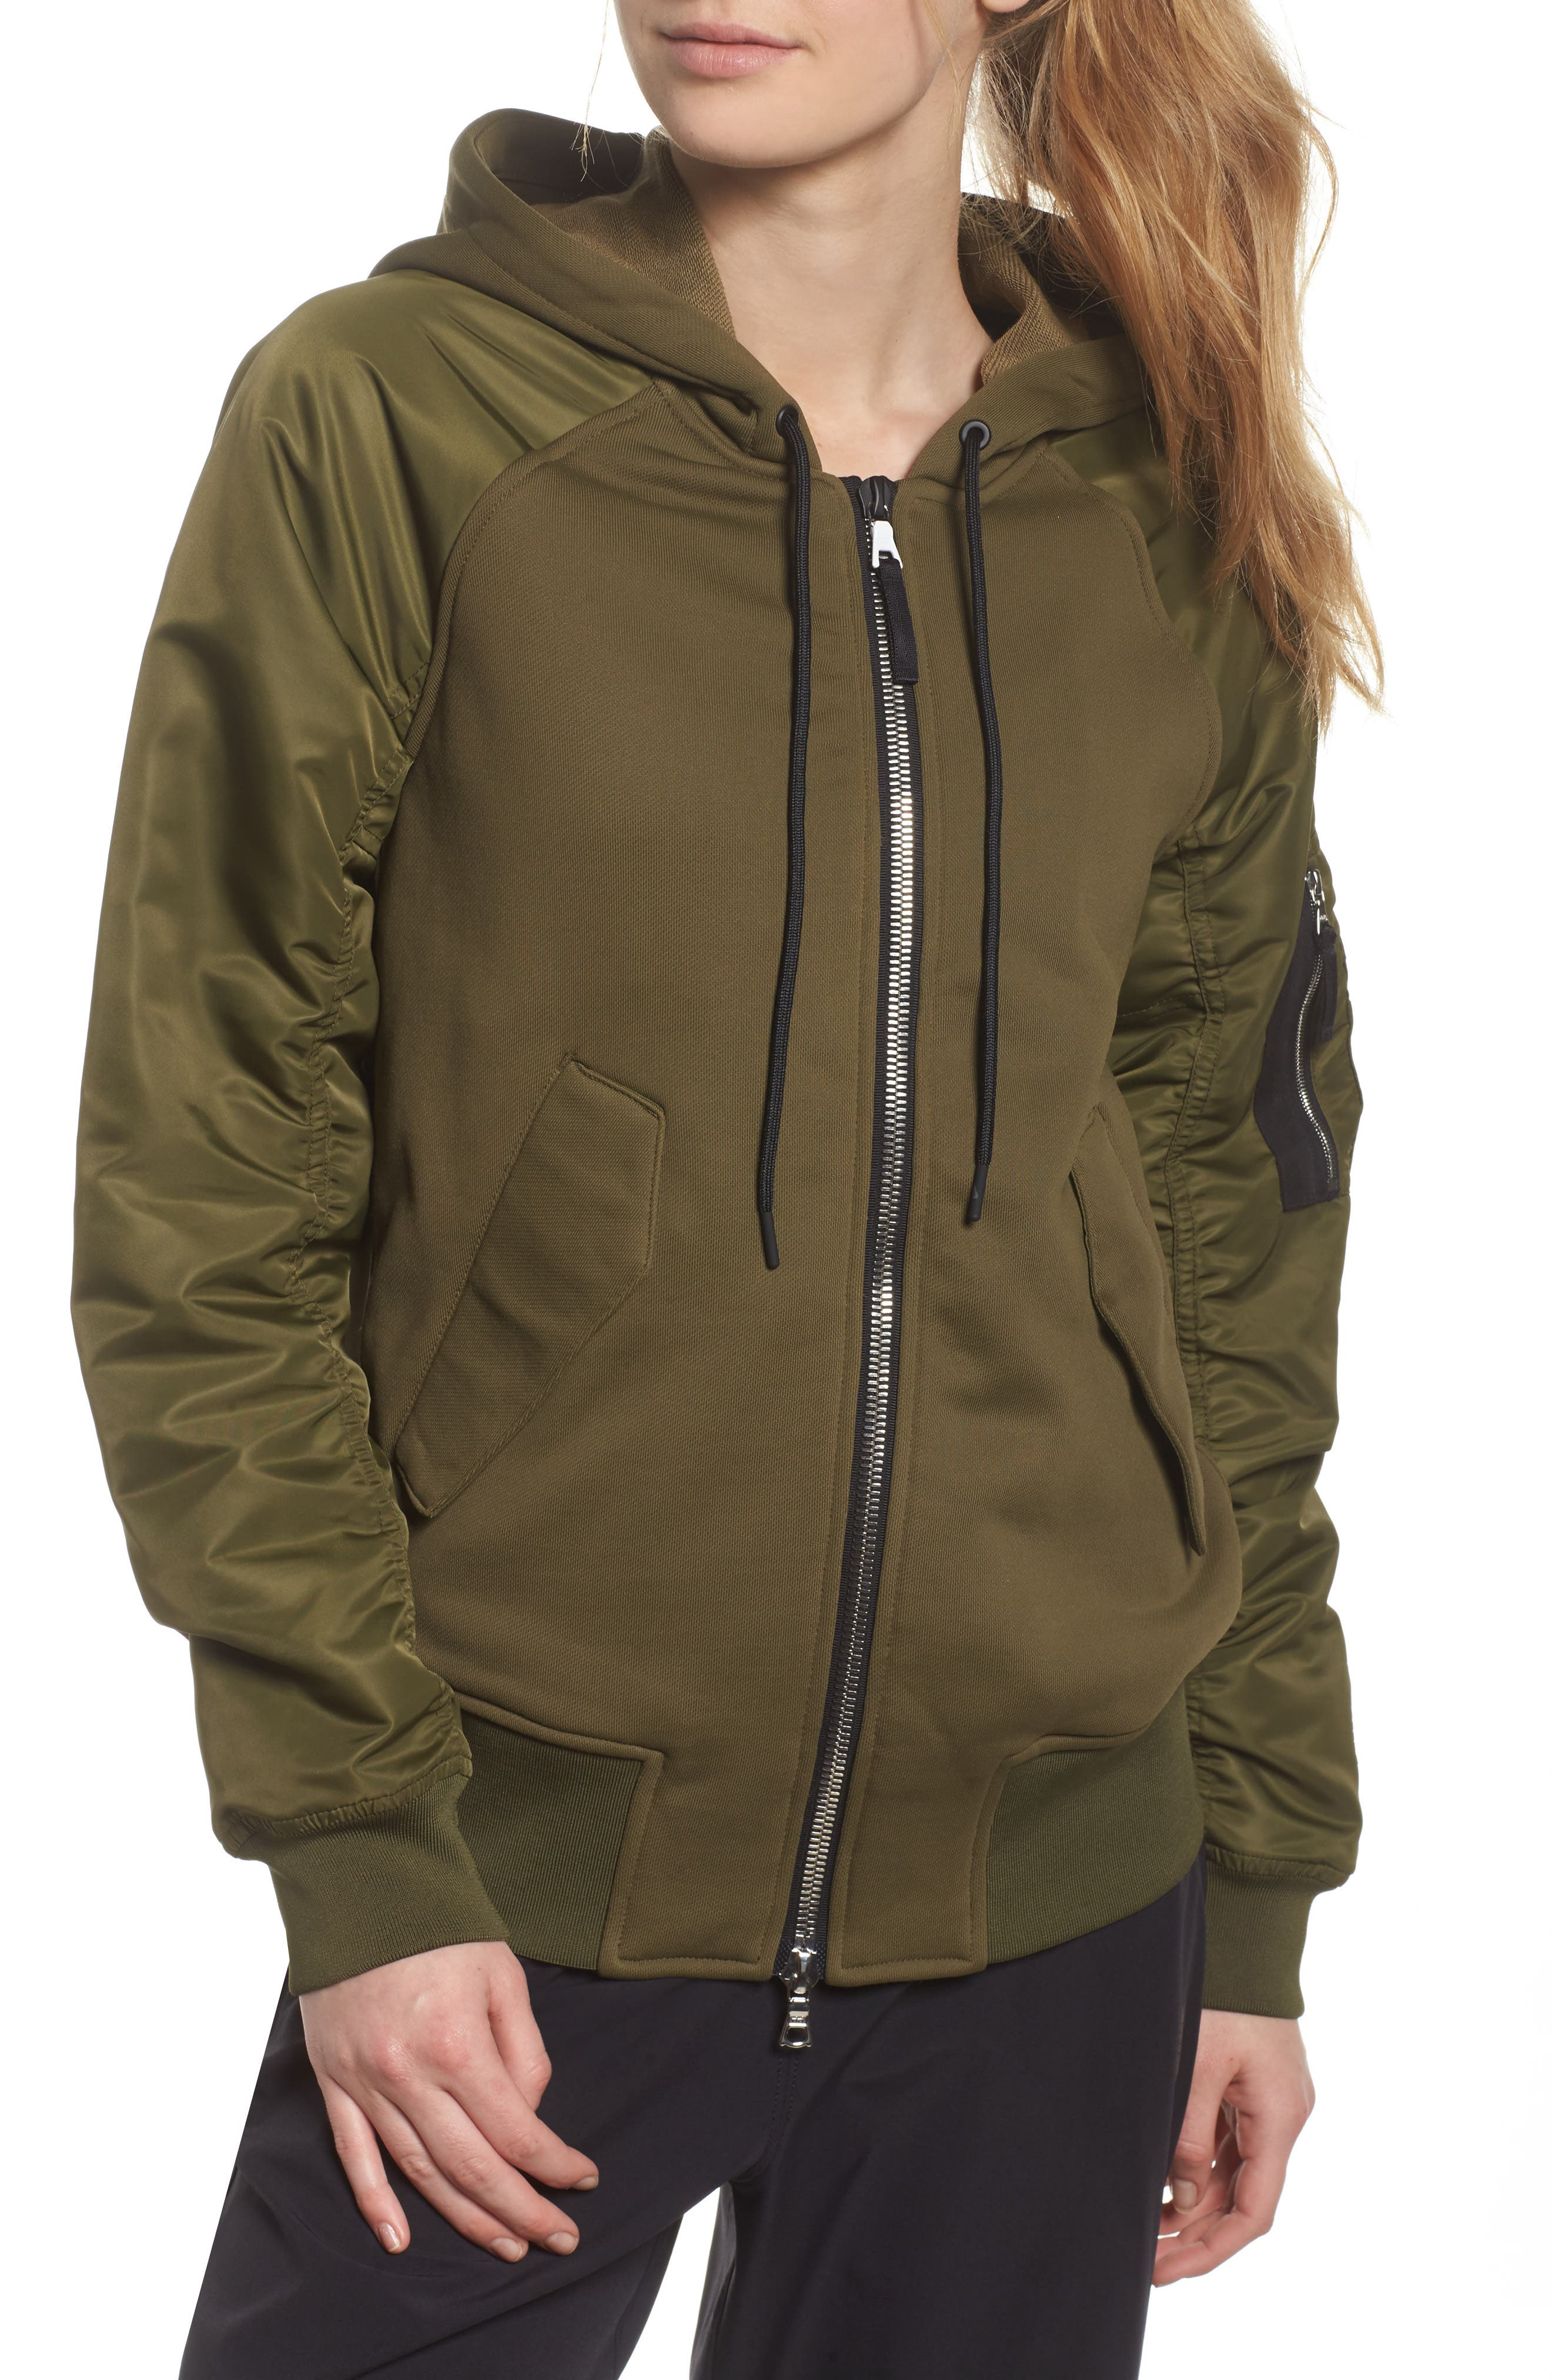 NikeLab Women's Mixed Media Bomber Jacket,                             Alternate thumbnail 4, color,                             Olive Canvas/ Black